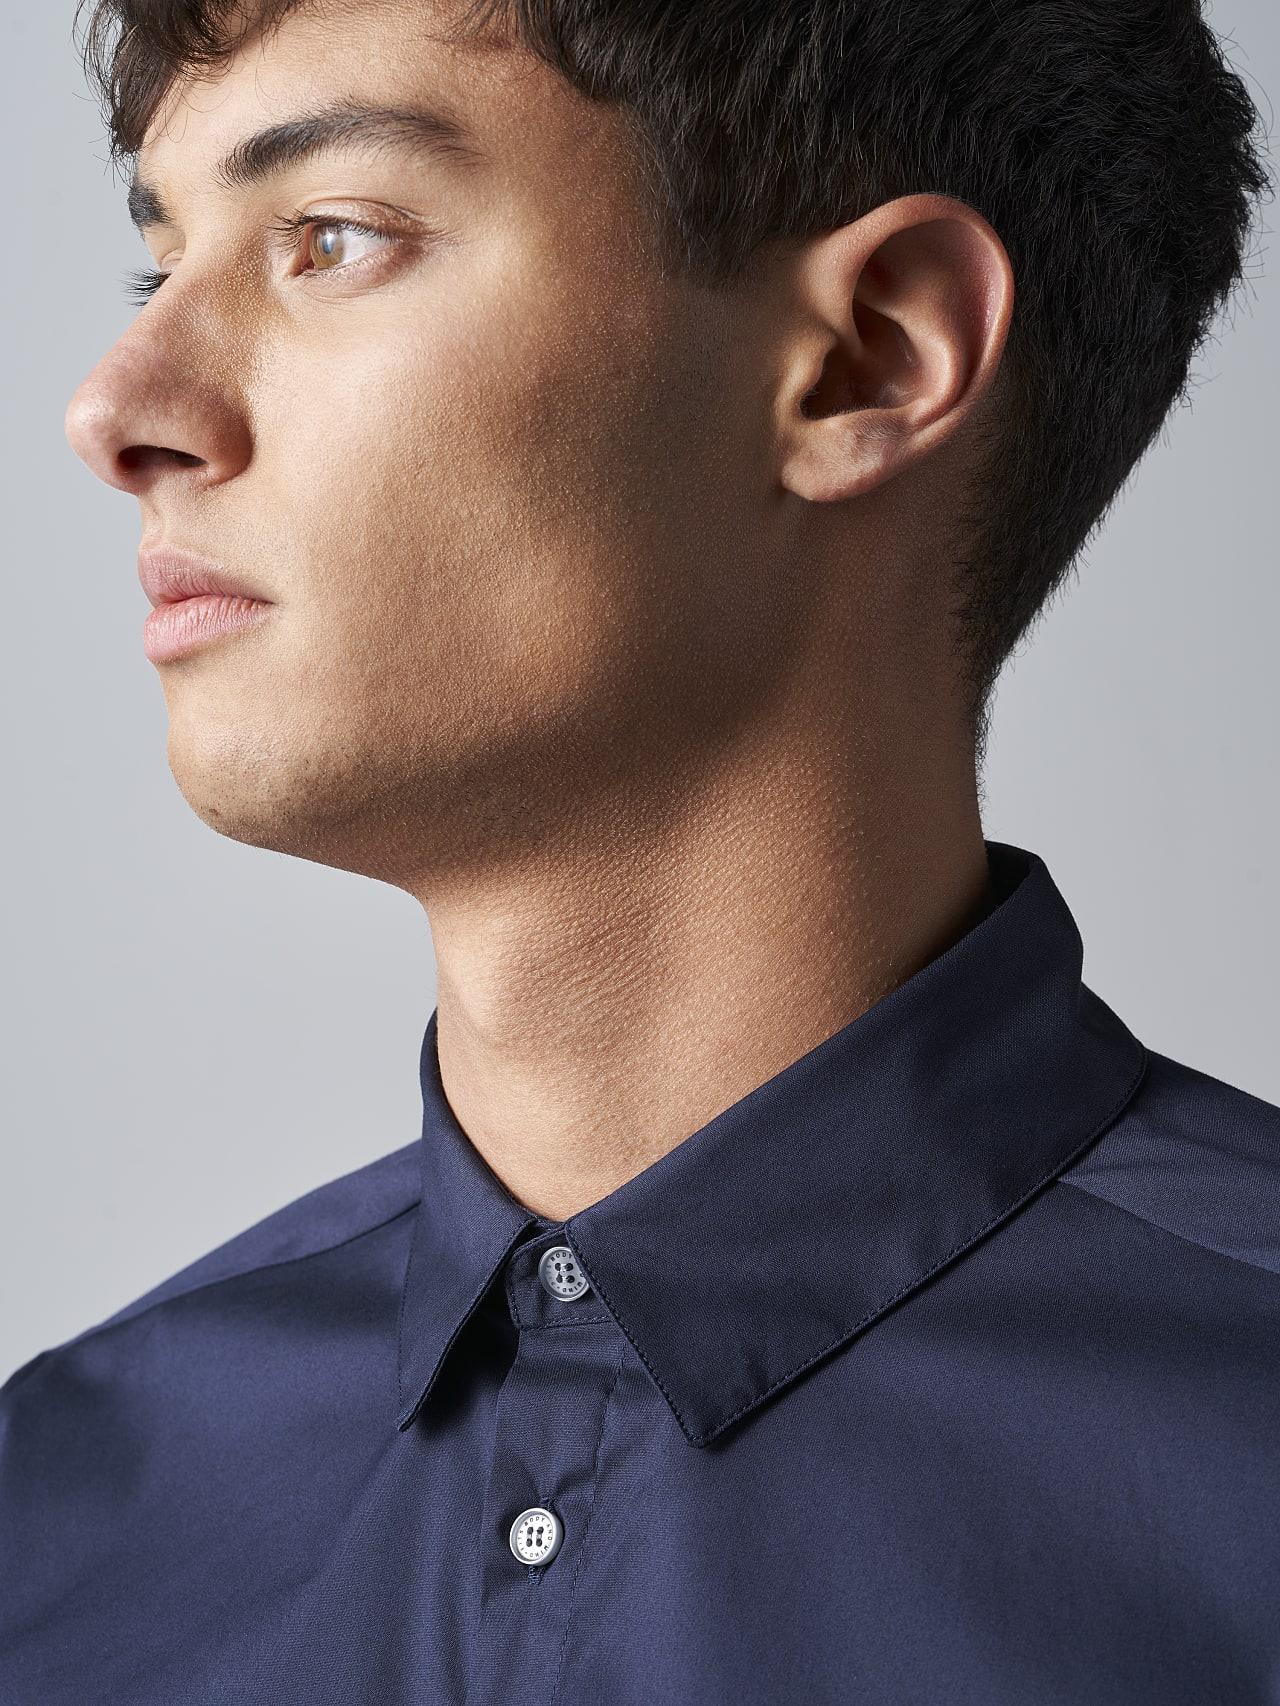 WAARG V2.Y5.02 Easy-Care Cotton Shirt navy Right Alpha Tauri